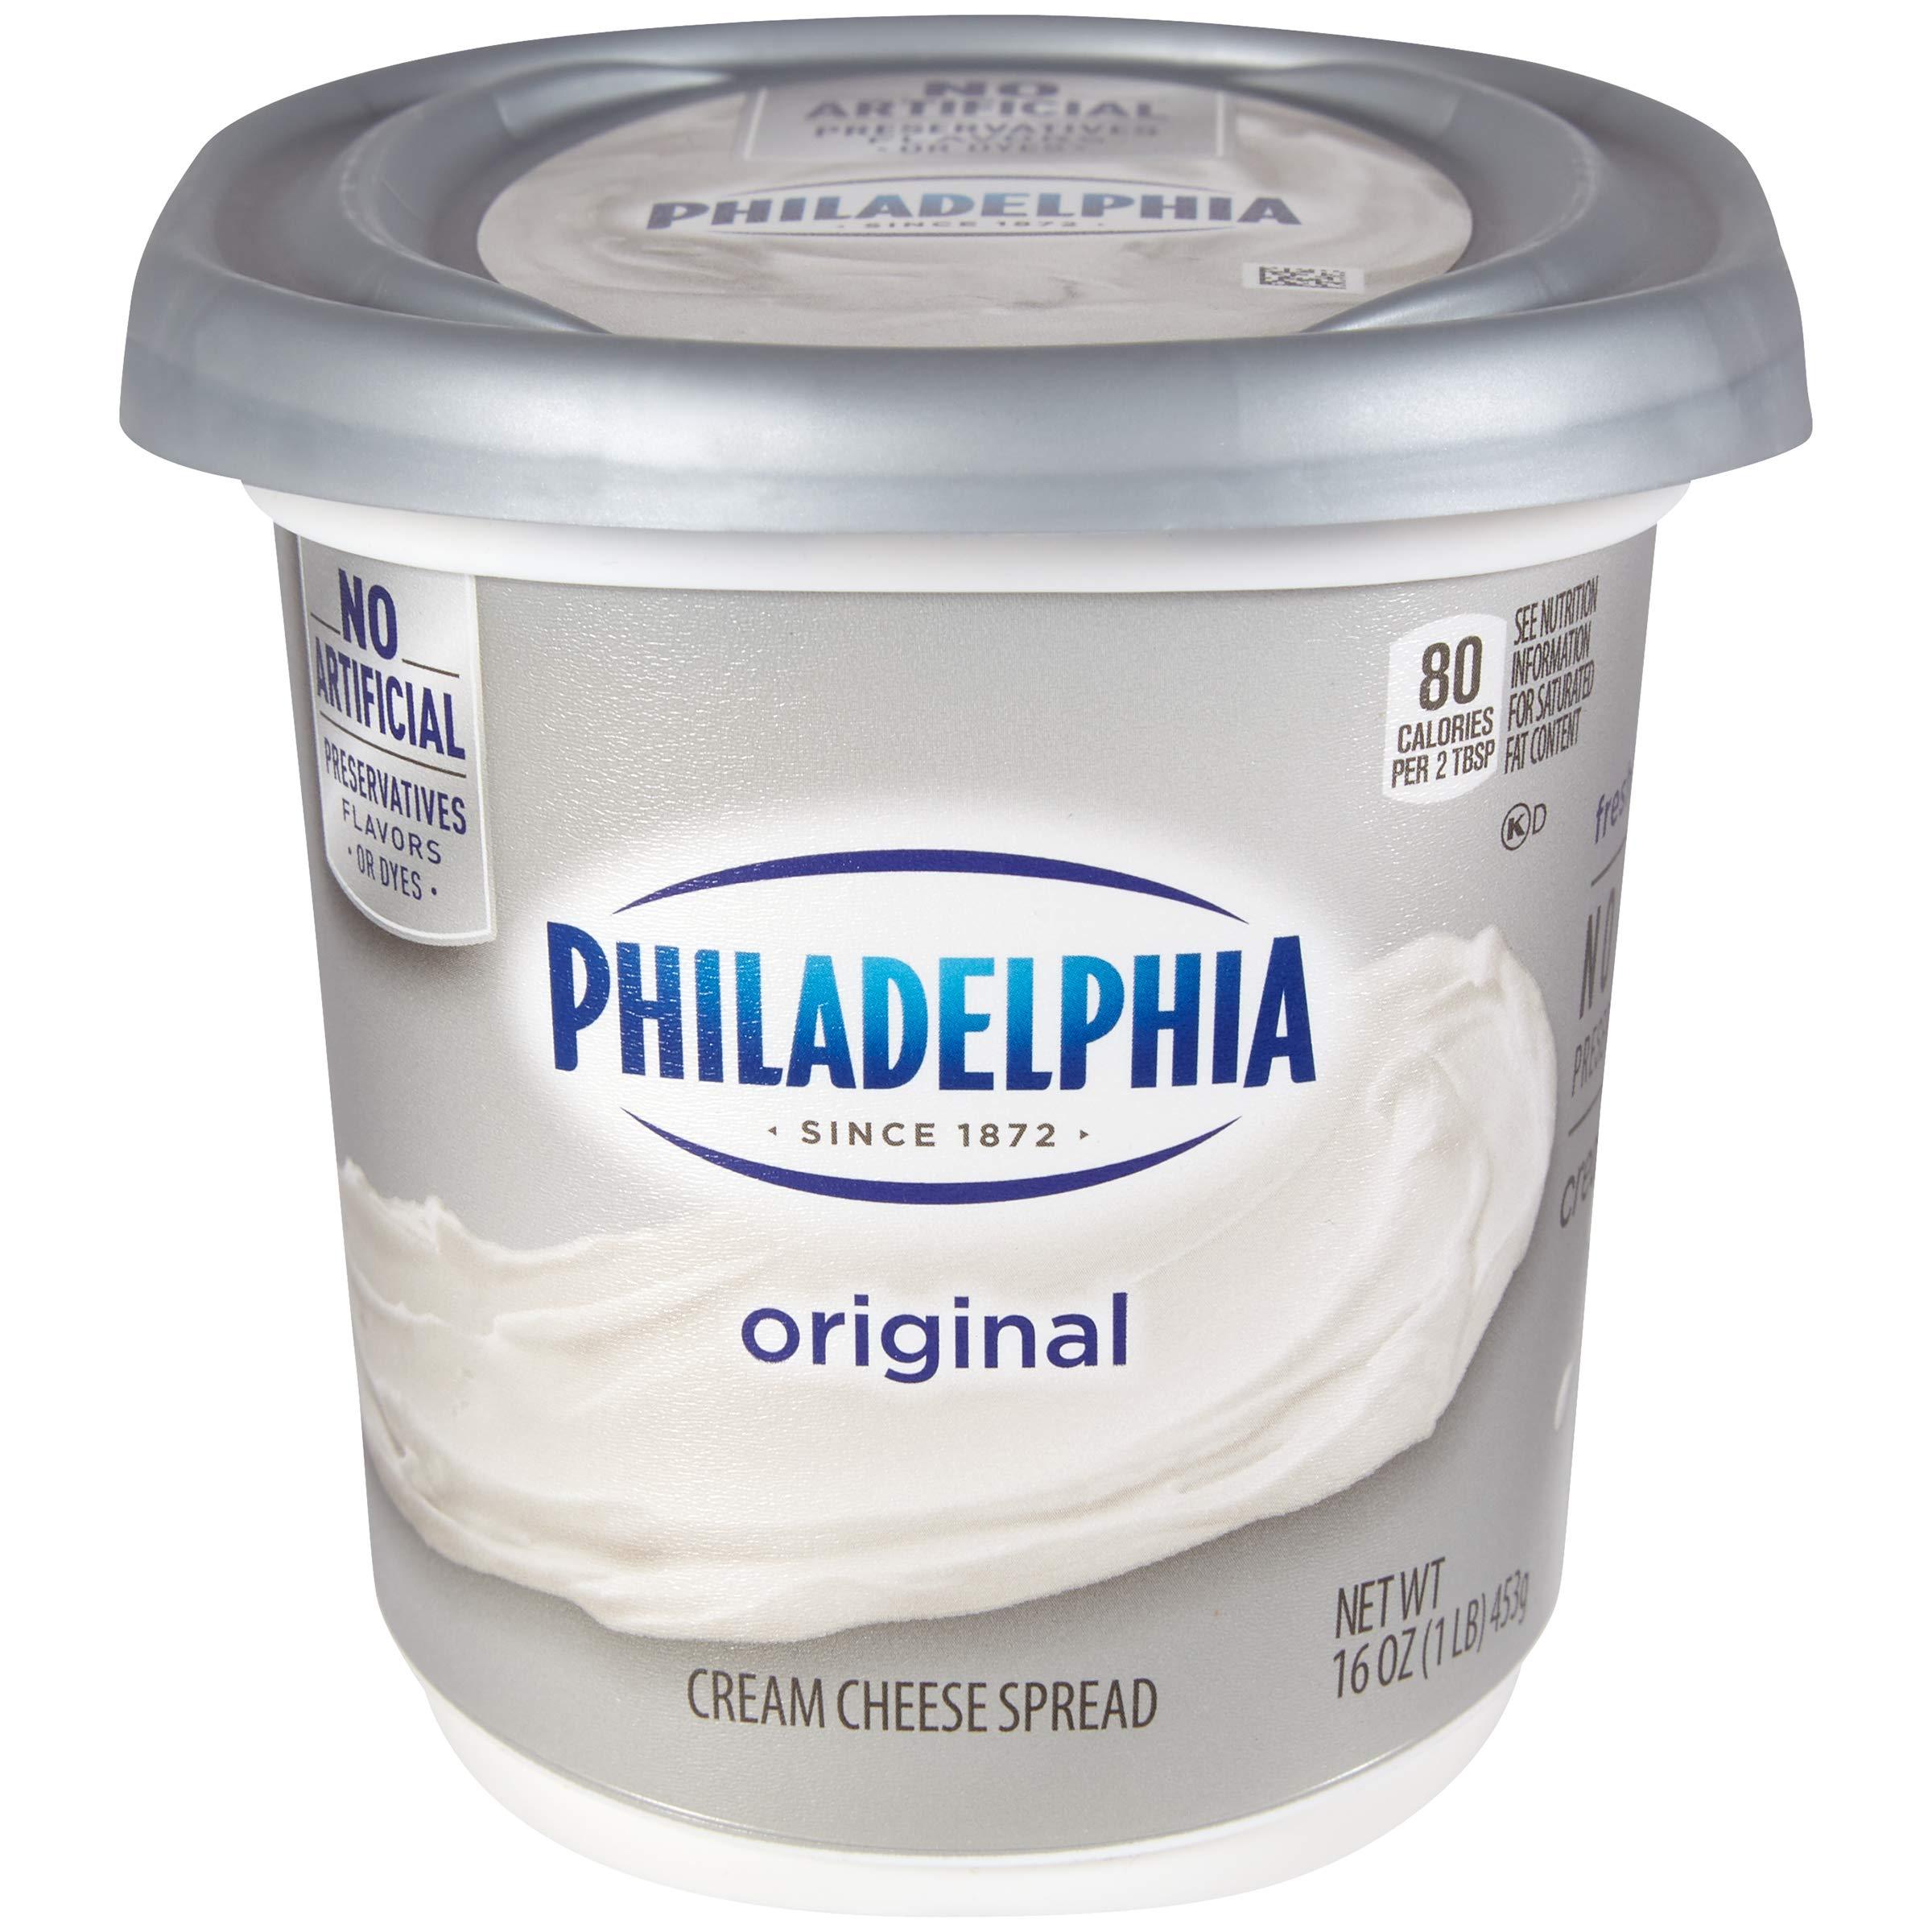 Philadelphia Original Cream Cheese Spread, 16 oz